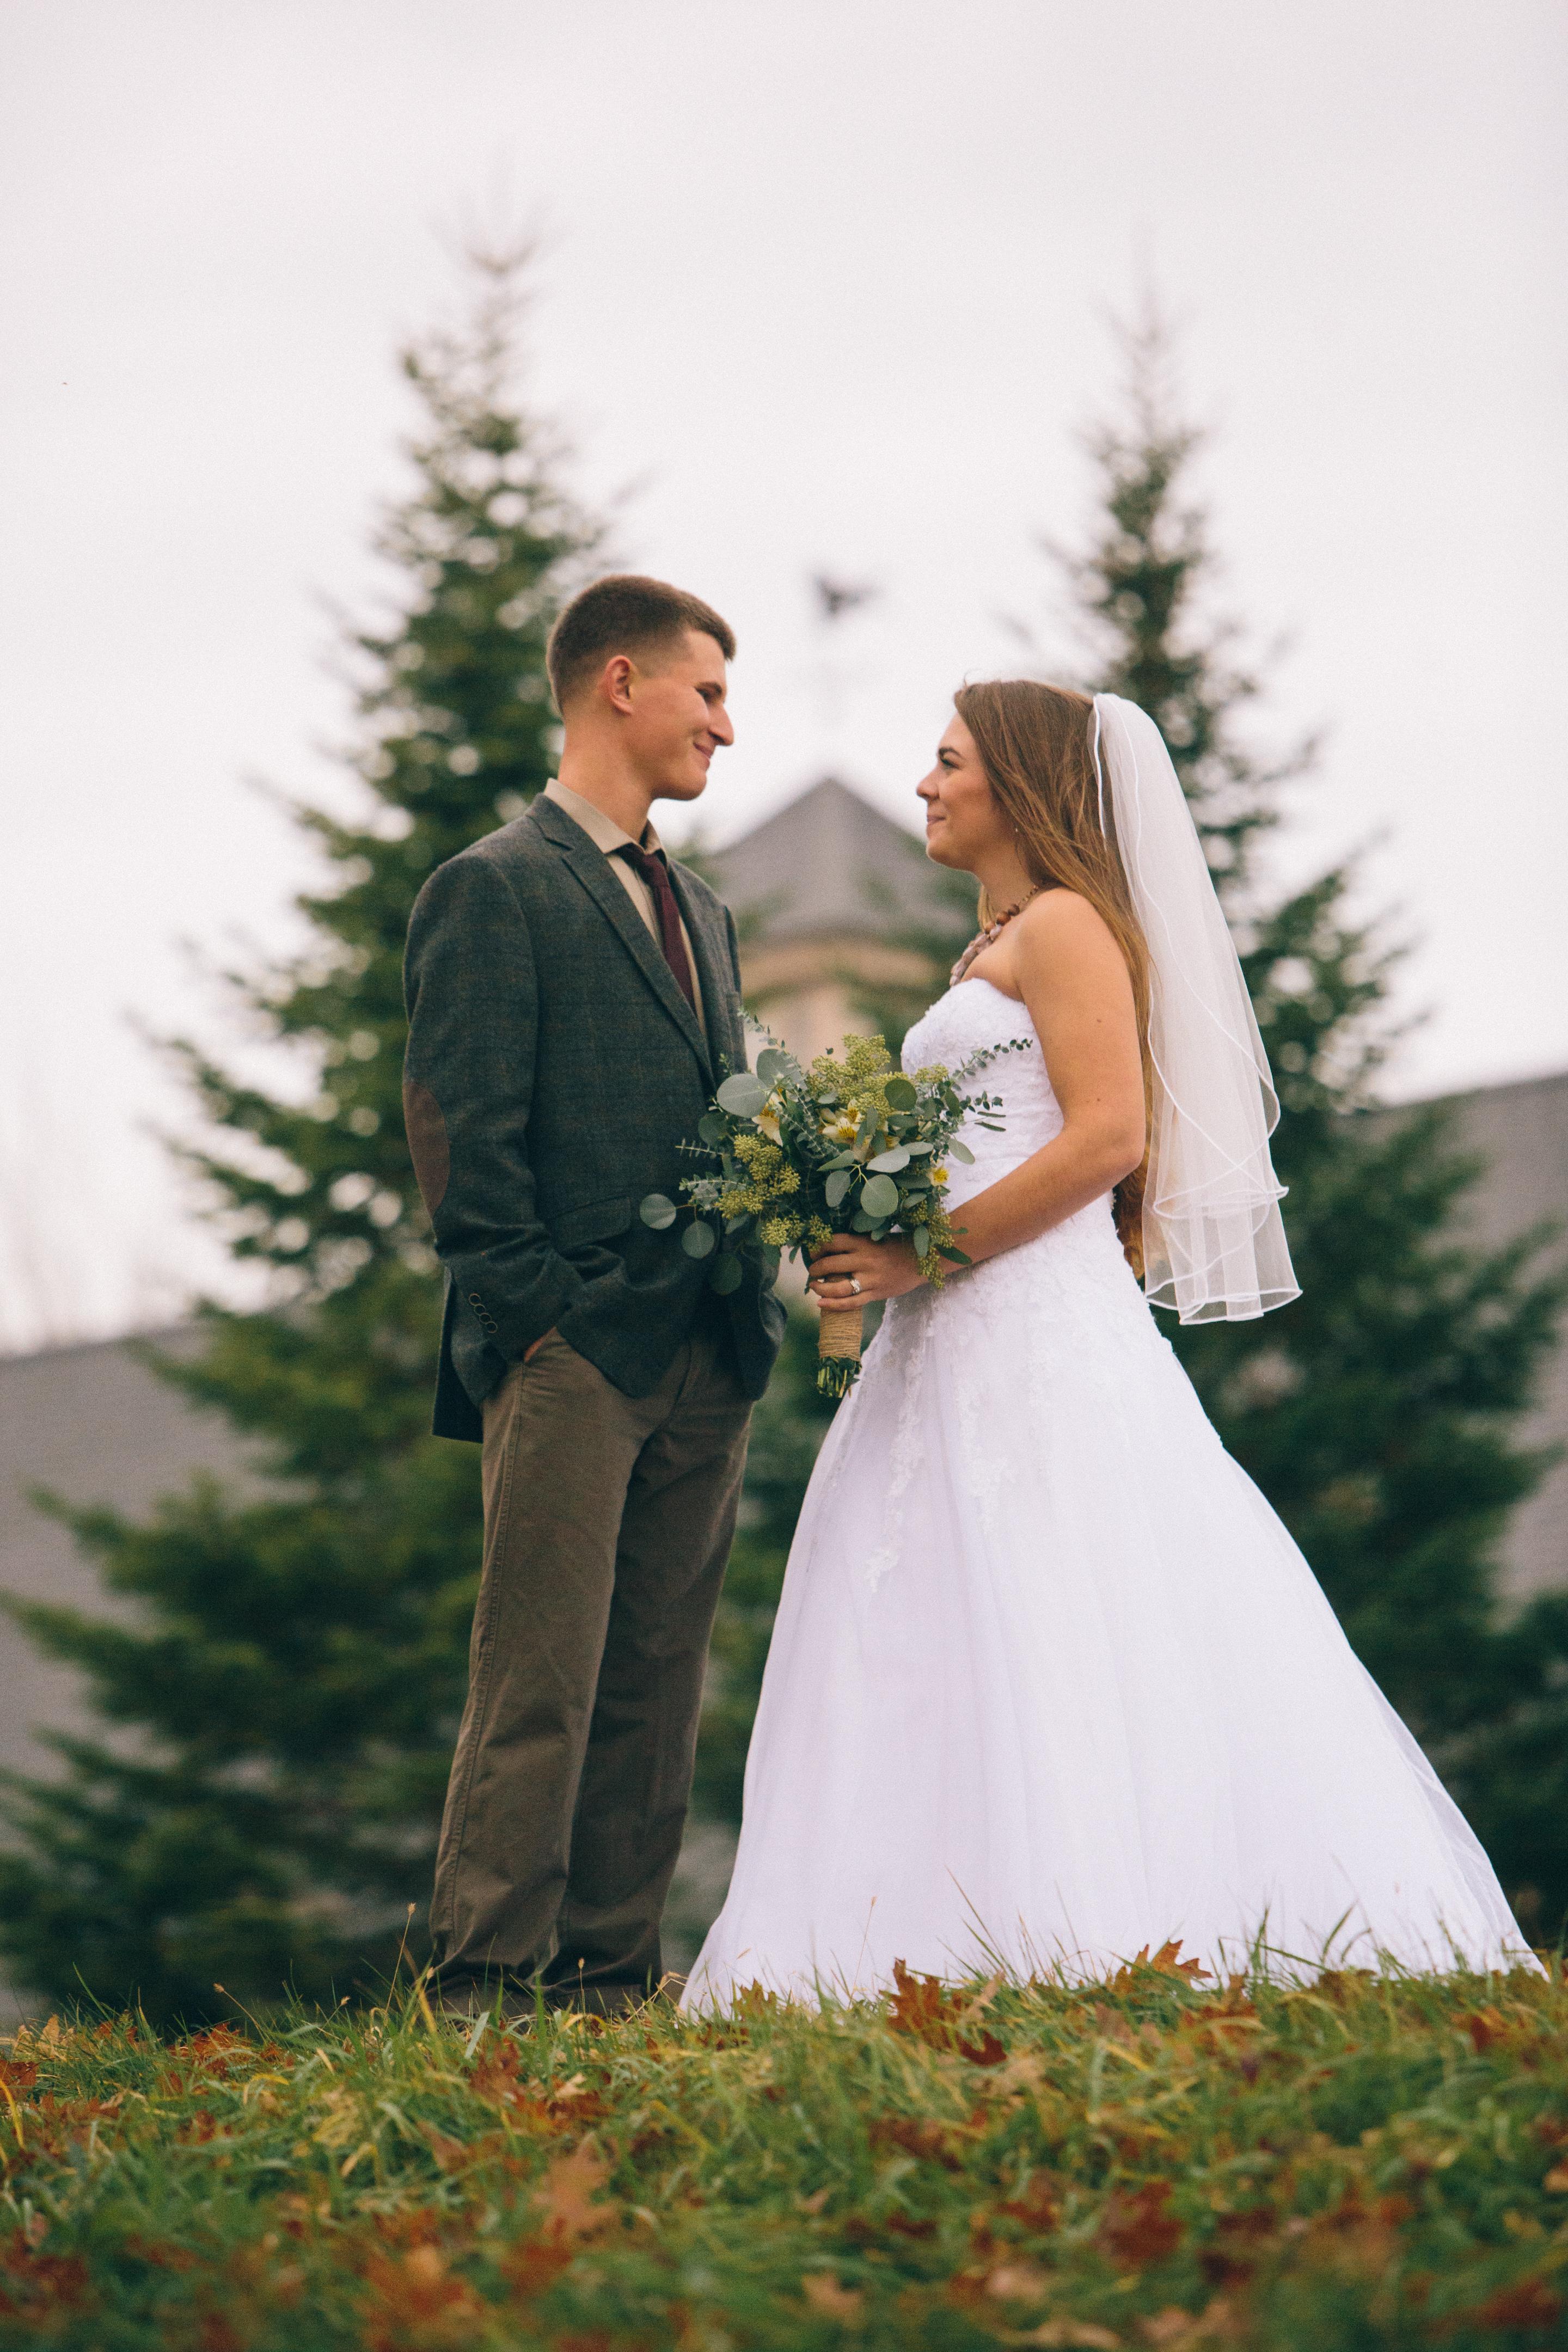 maine-barn-wedding-venue25 - Maine Event Barn